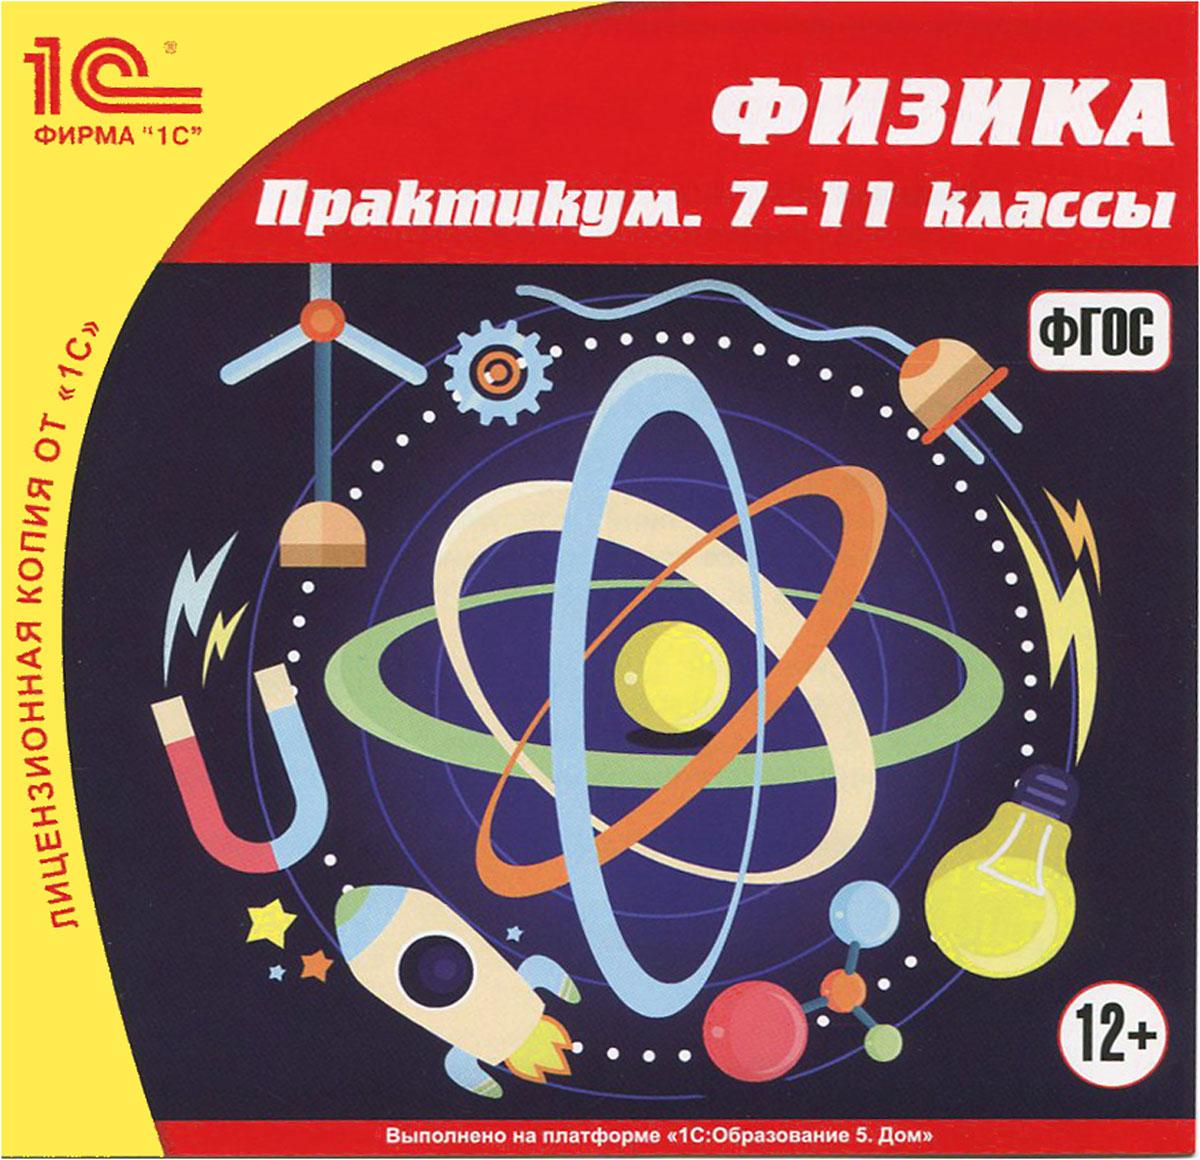 1С:Школа. Физика. Практикум. 7-11 класс (ФГОС) teach pro физика дистанционное обучение